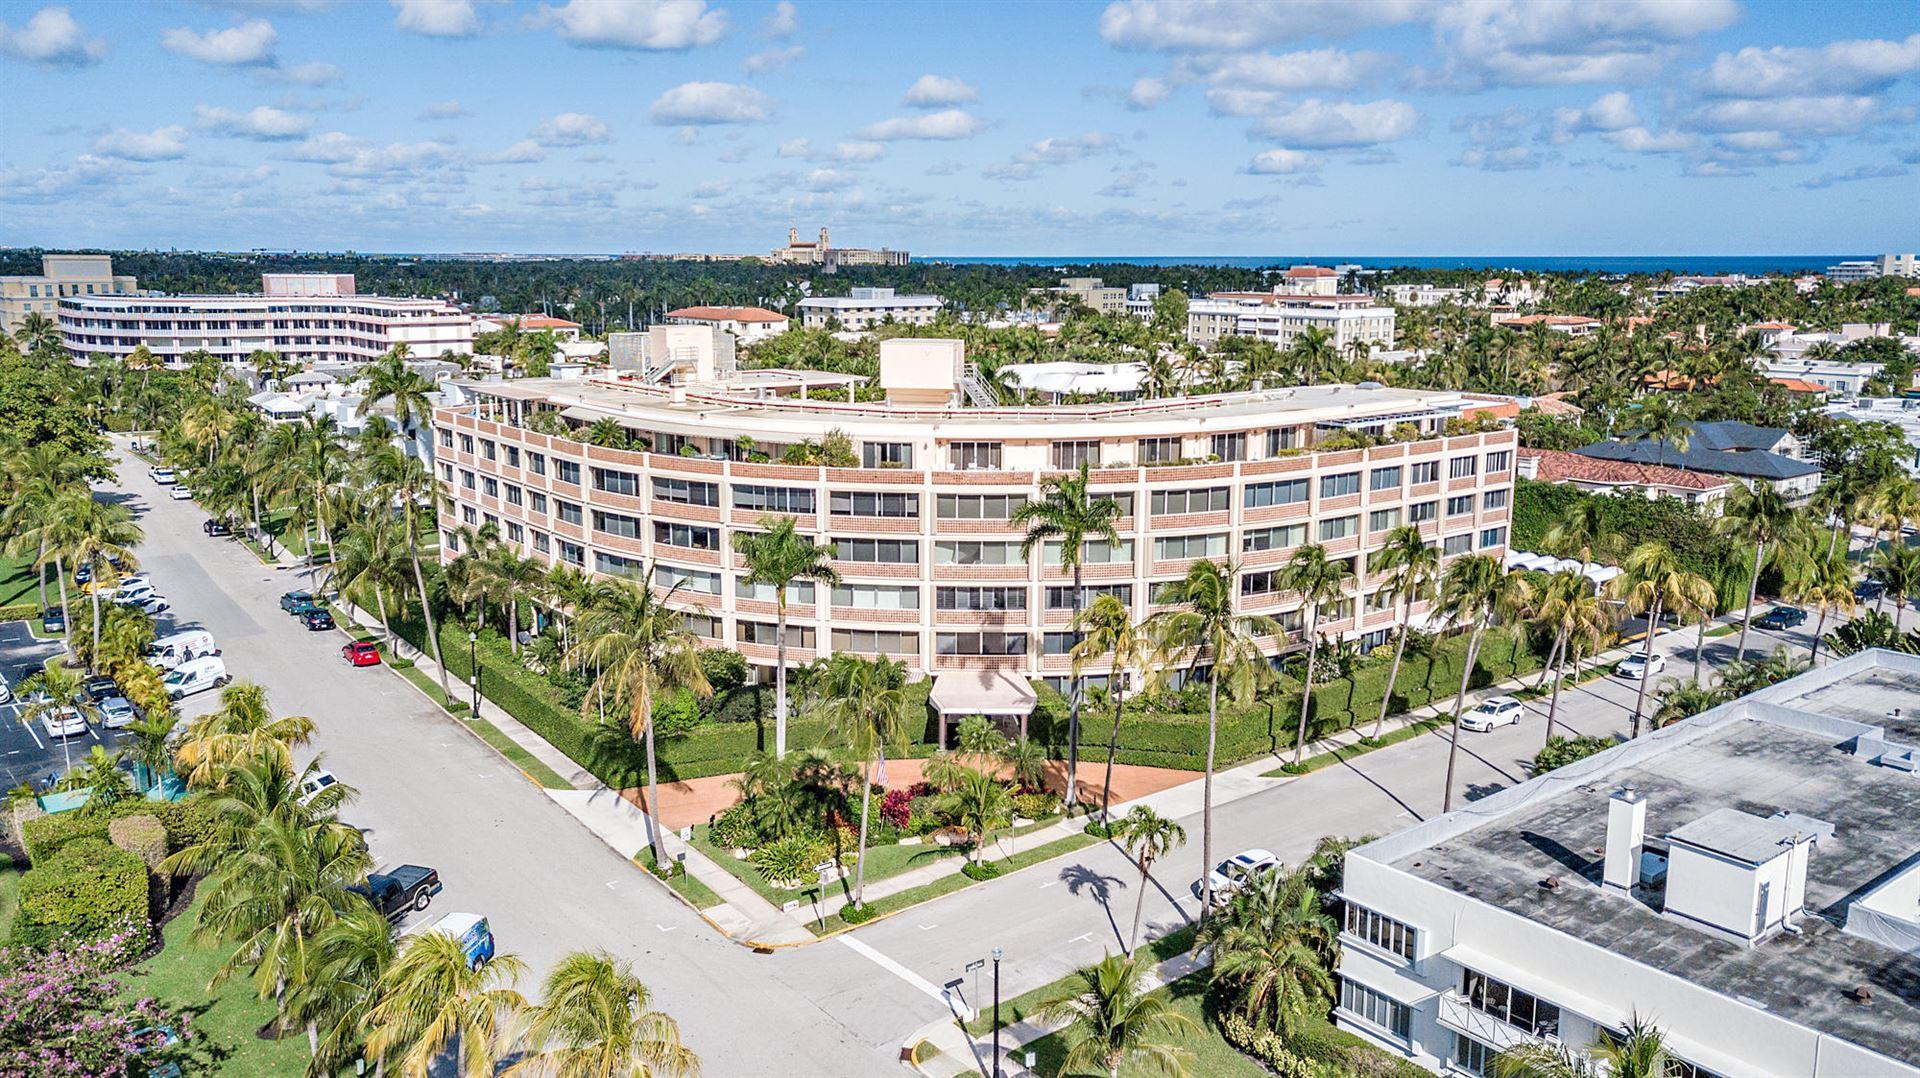 369 S Lake Drive #1g, Palm Beach, FL 33480 - #: RX-10584078